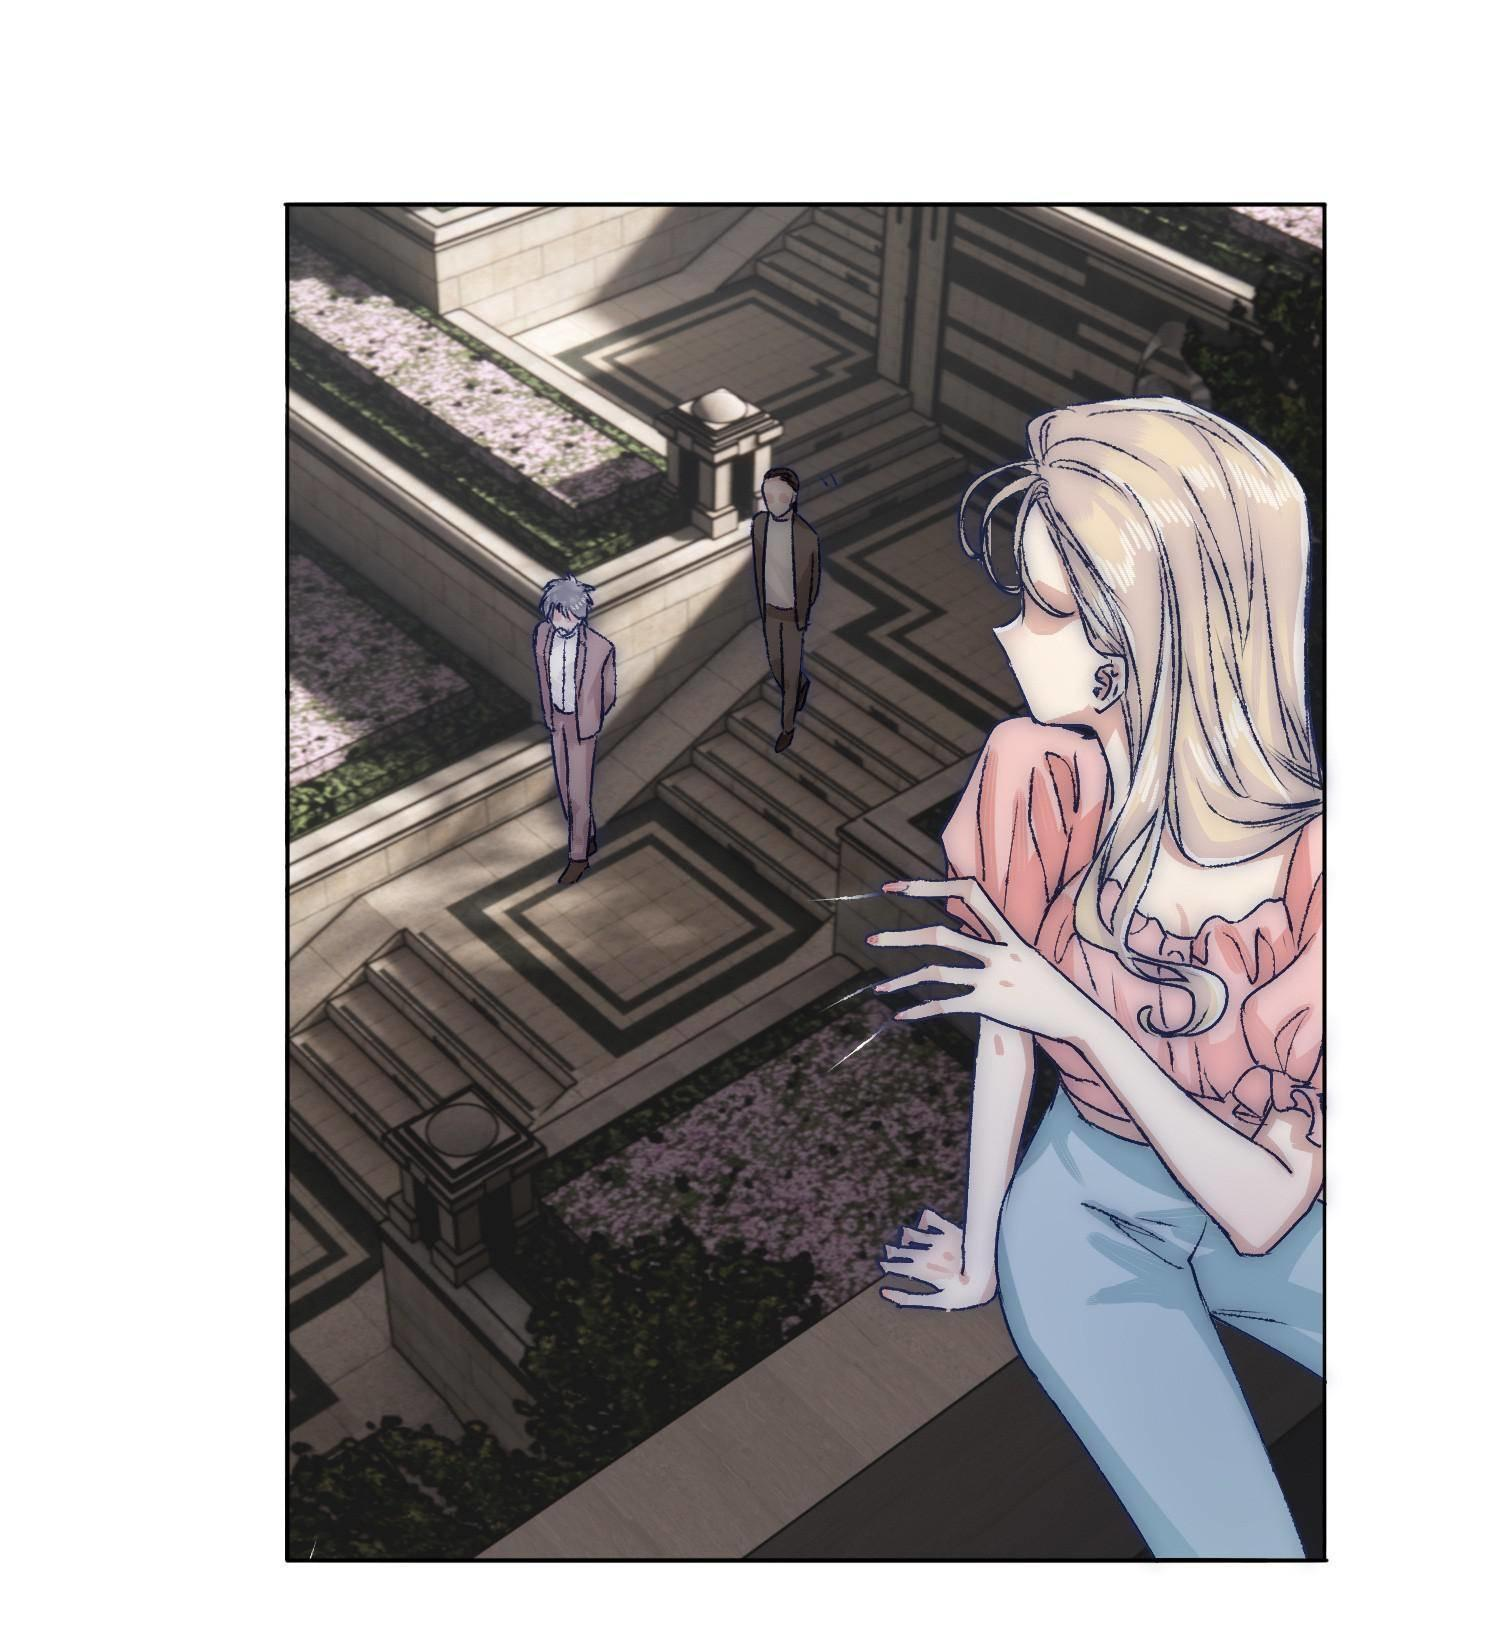 I Offer My Neck To You Chapter 72 page 2 - Mangakakalot